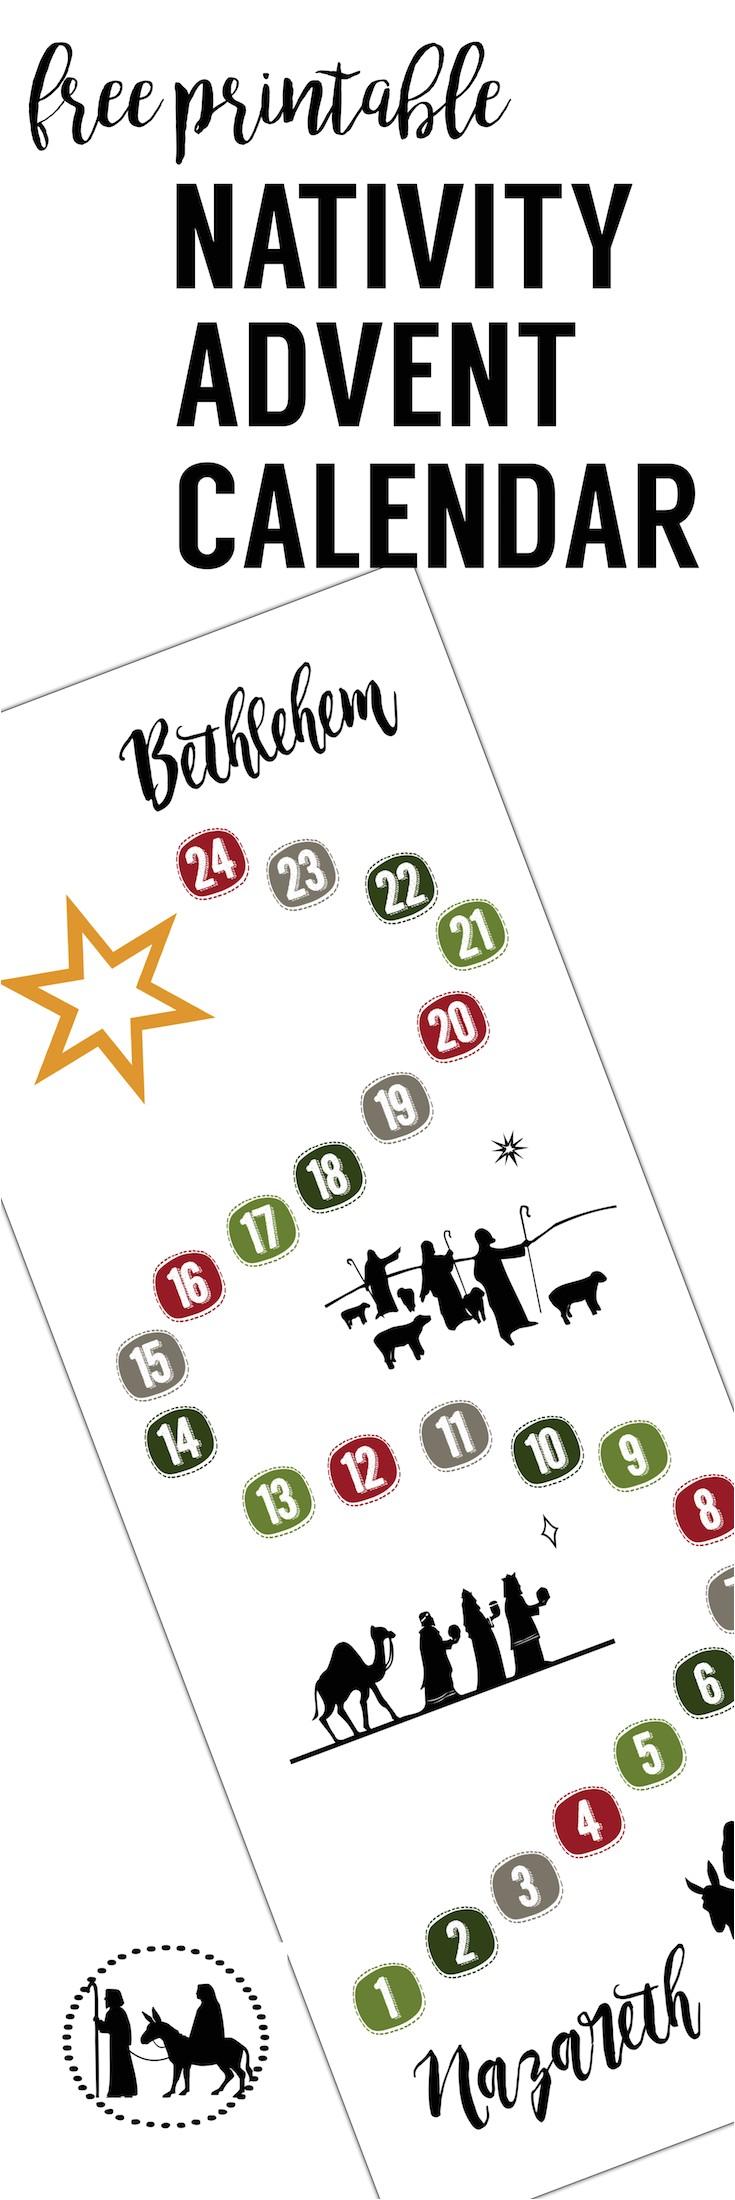 Online Advent Calendar Template Free Advent Calendar Printable Paper Trail Design